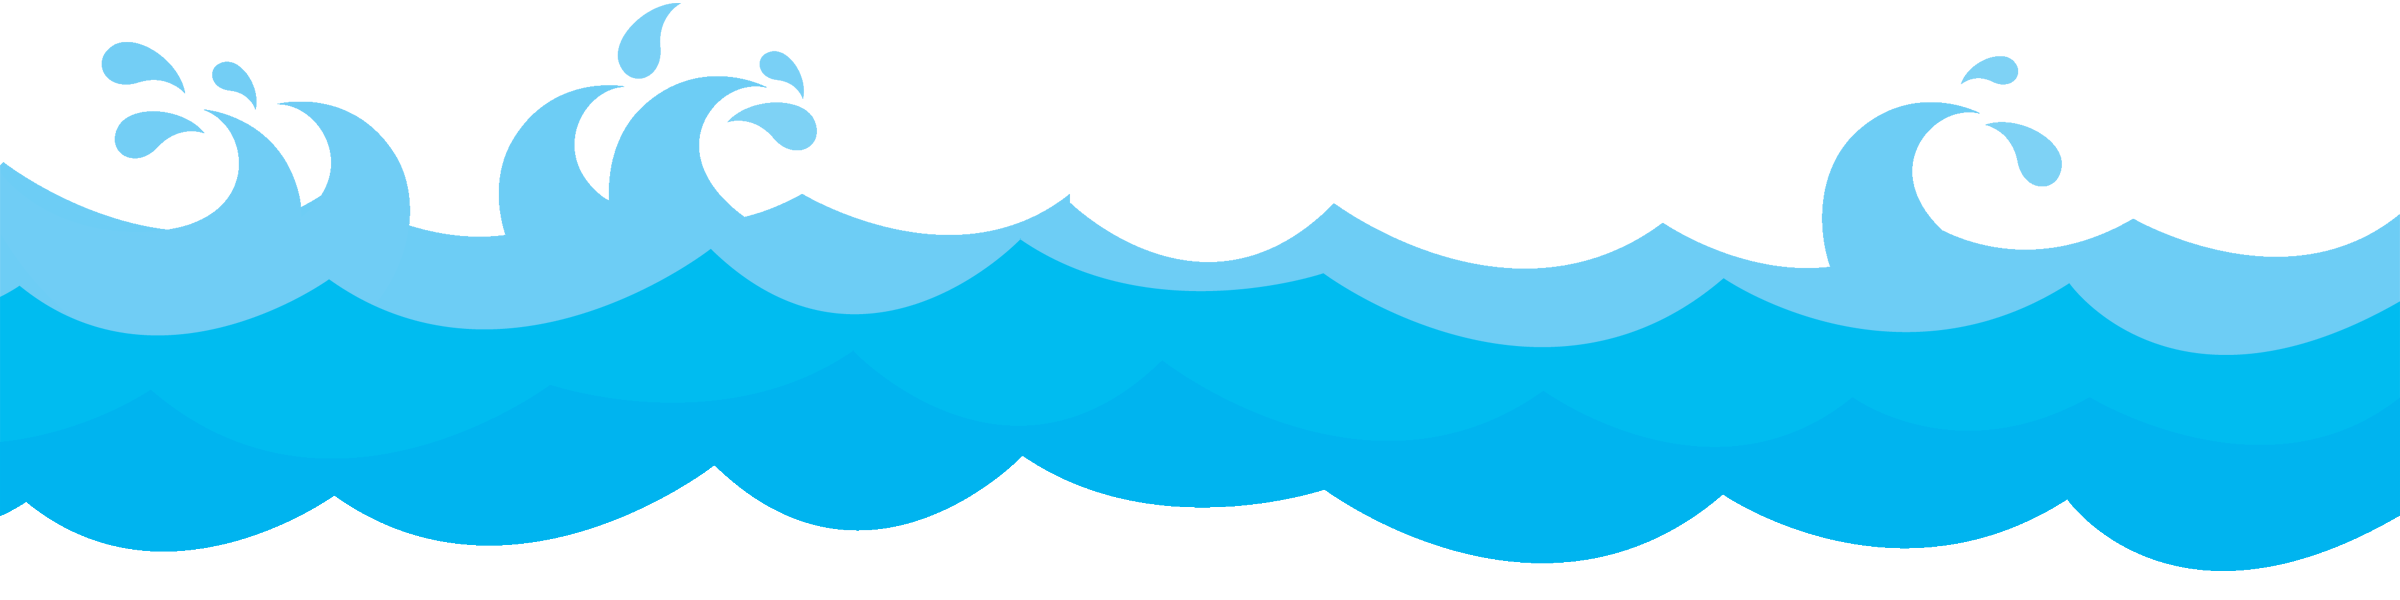 kisspng-wind-wave-wave-pool-ocean-clip-art-wave-5abb78d34dc155.1490879315222356033185.png